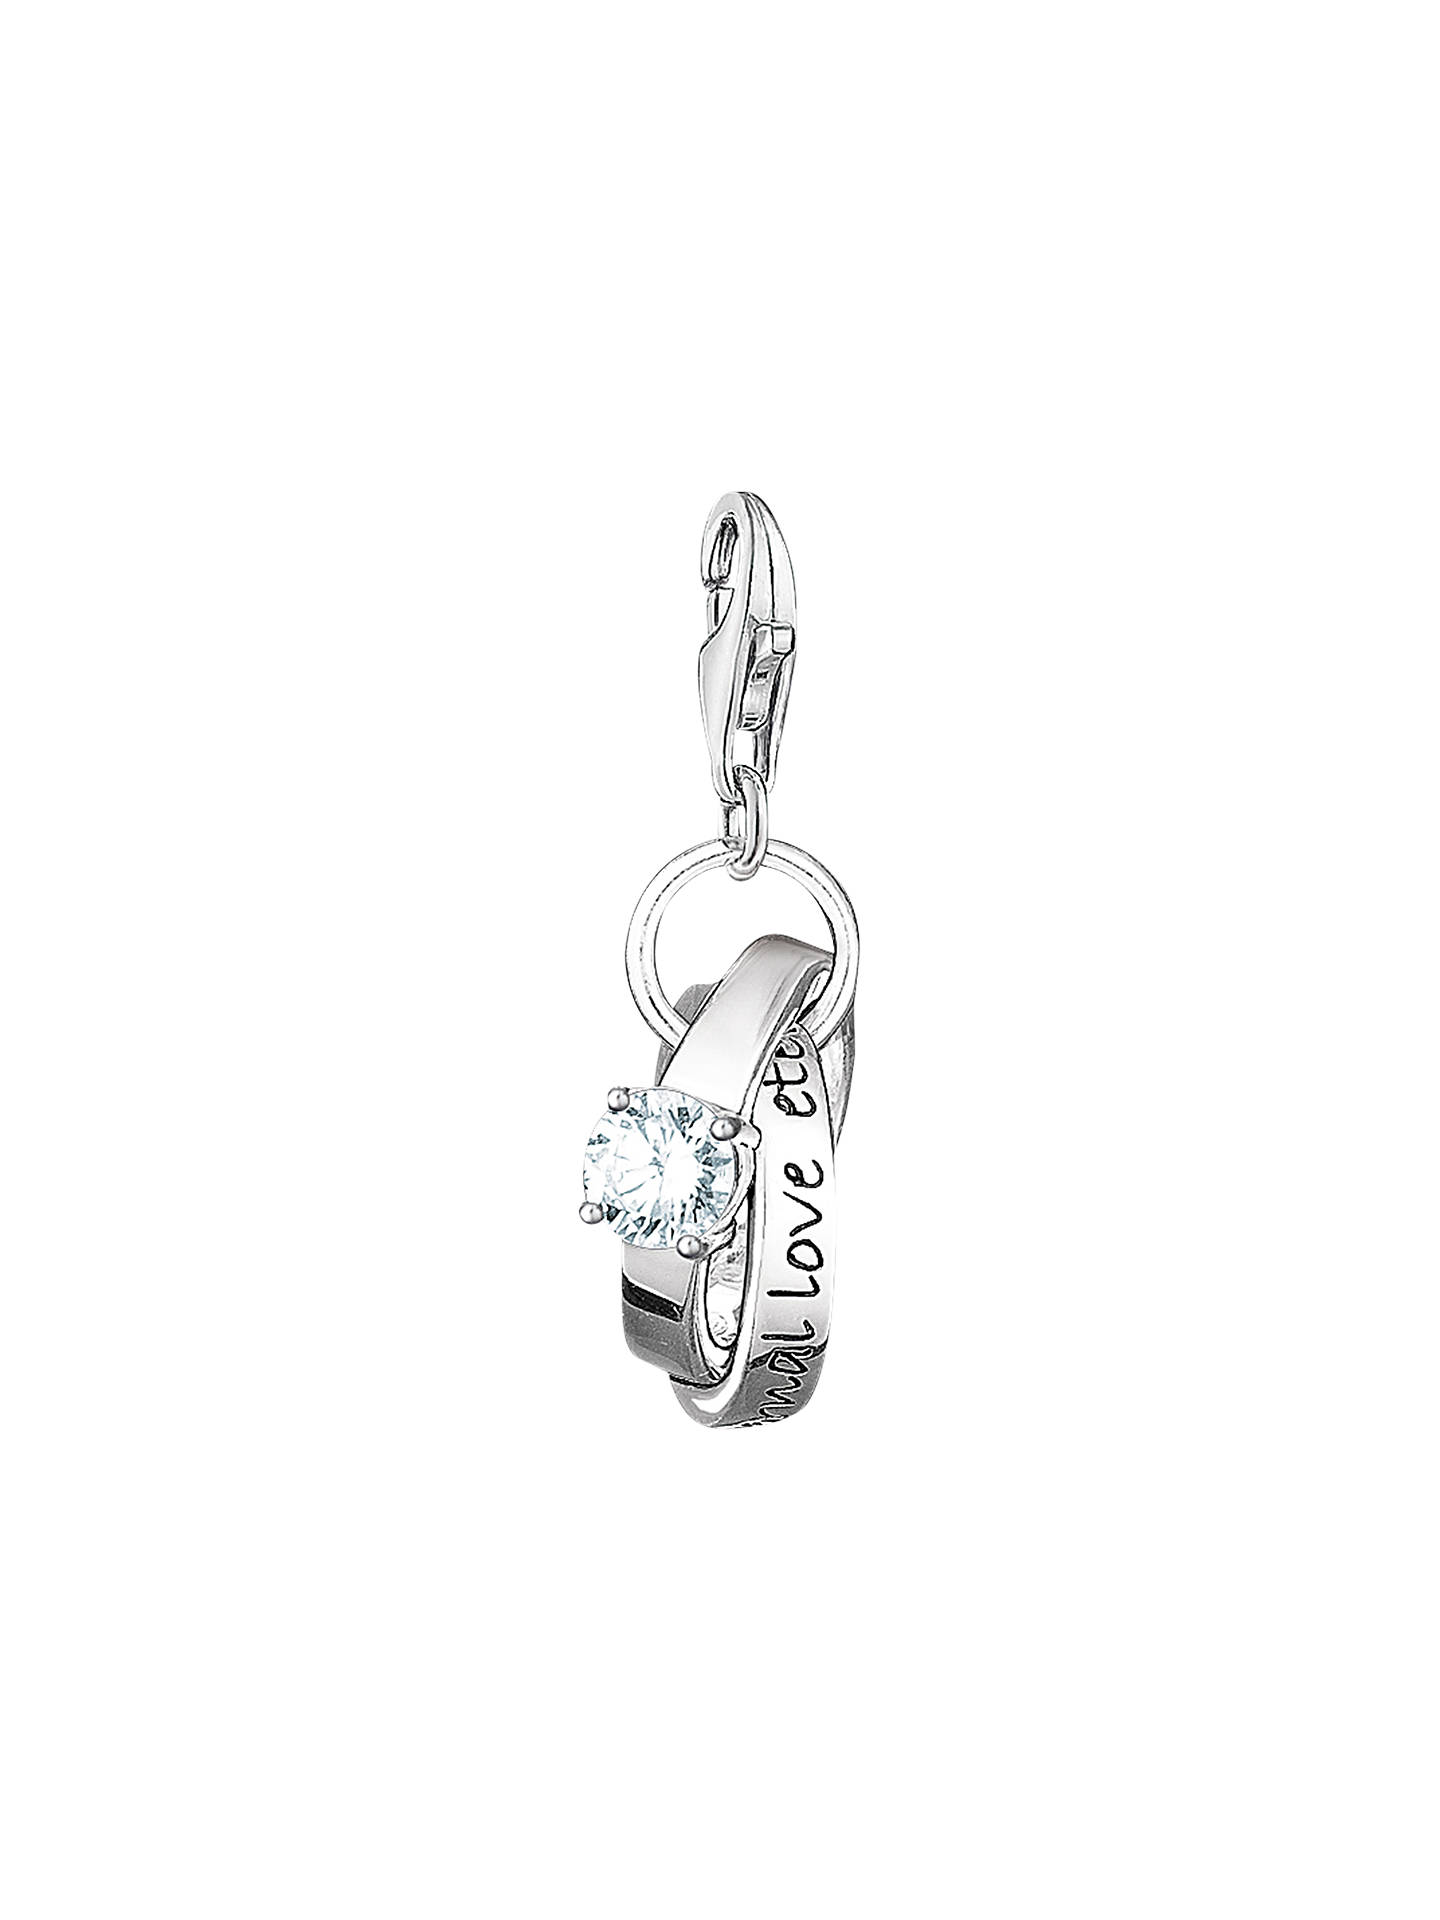 Thomas Sabo Charm Club Wedding Rings Silver Online At Johnlewis